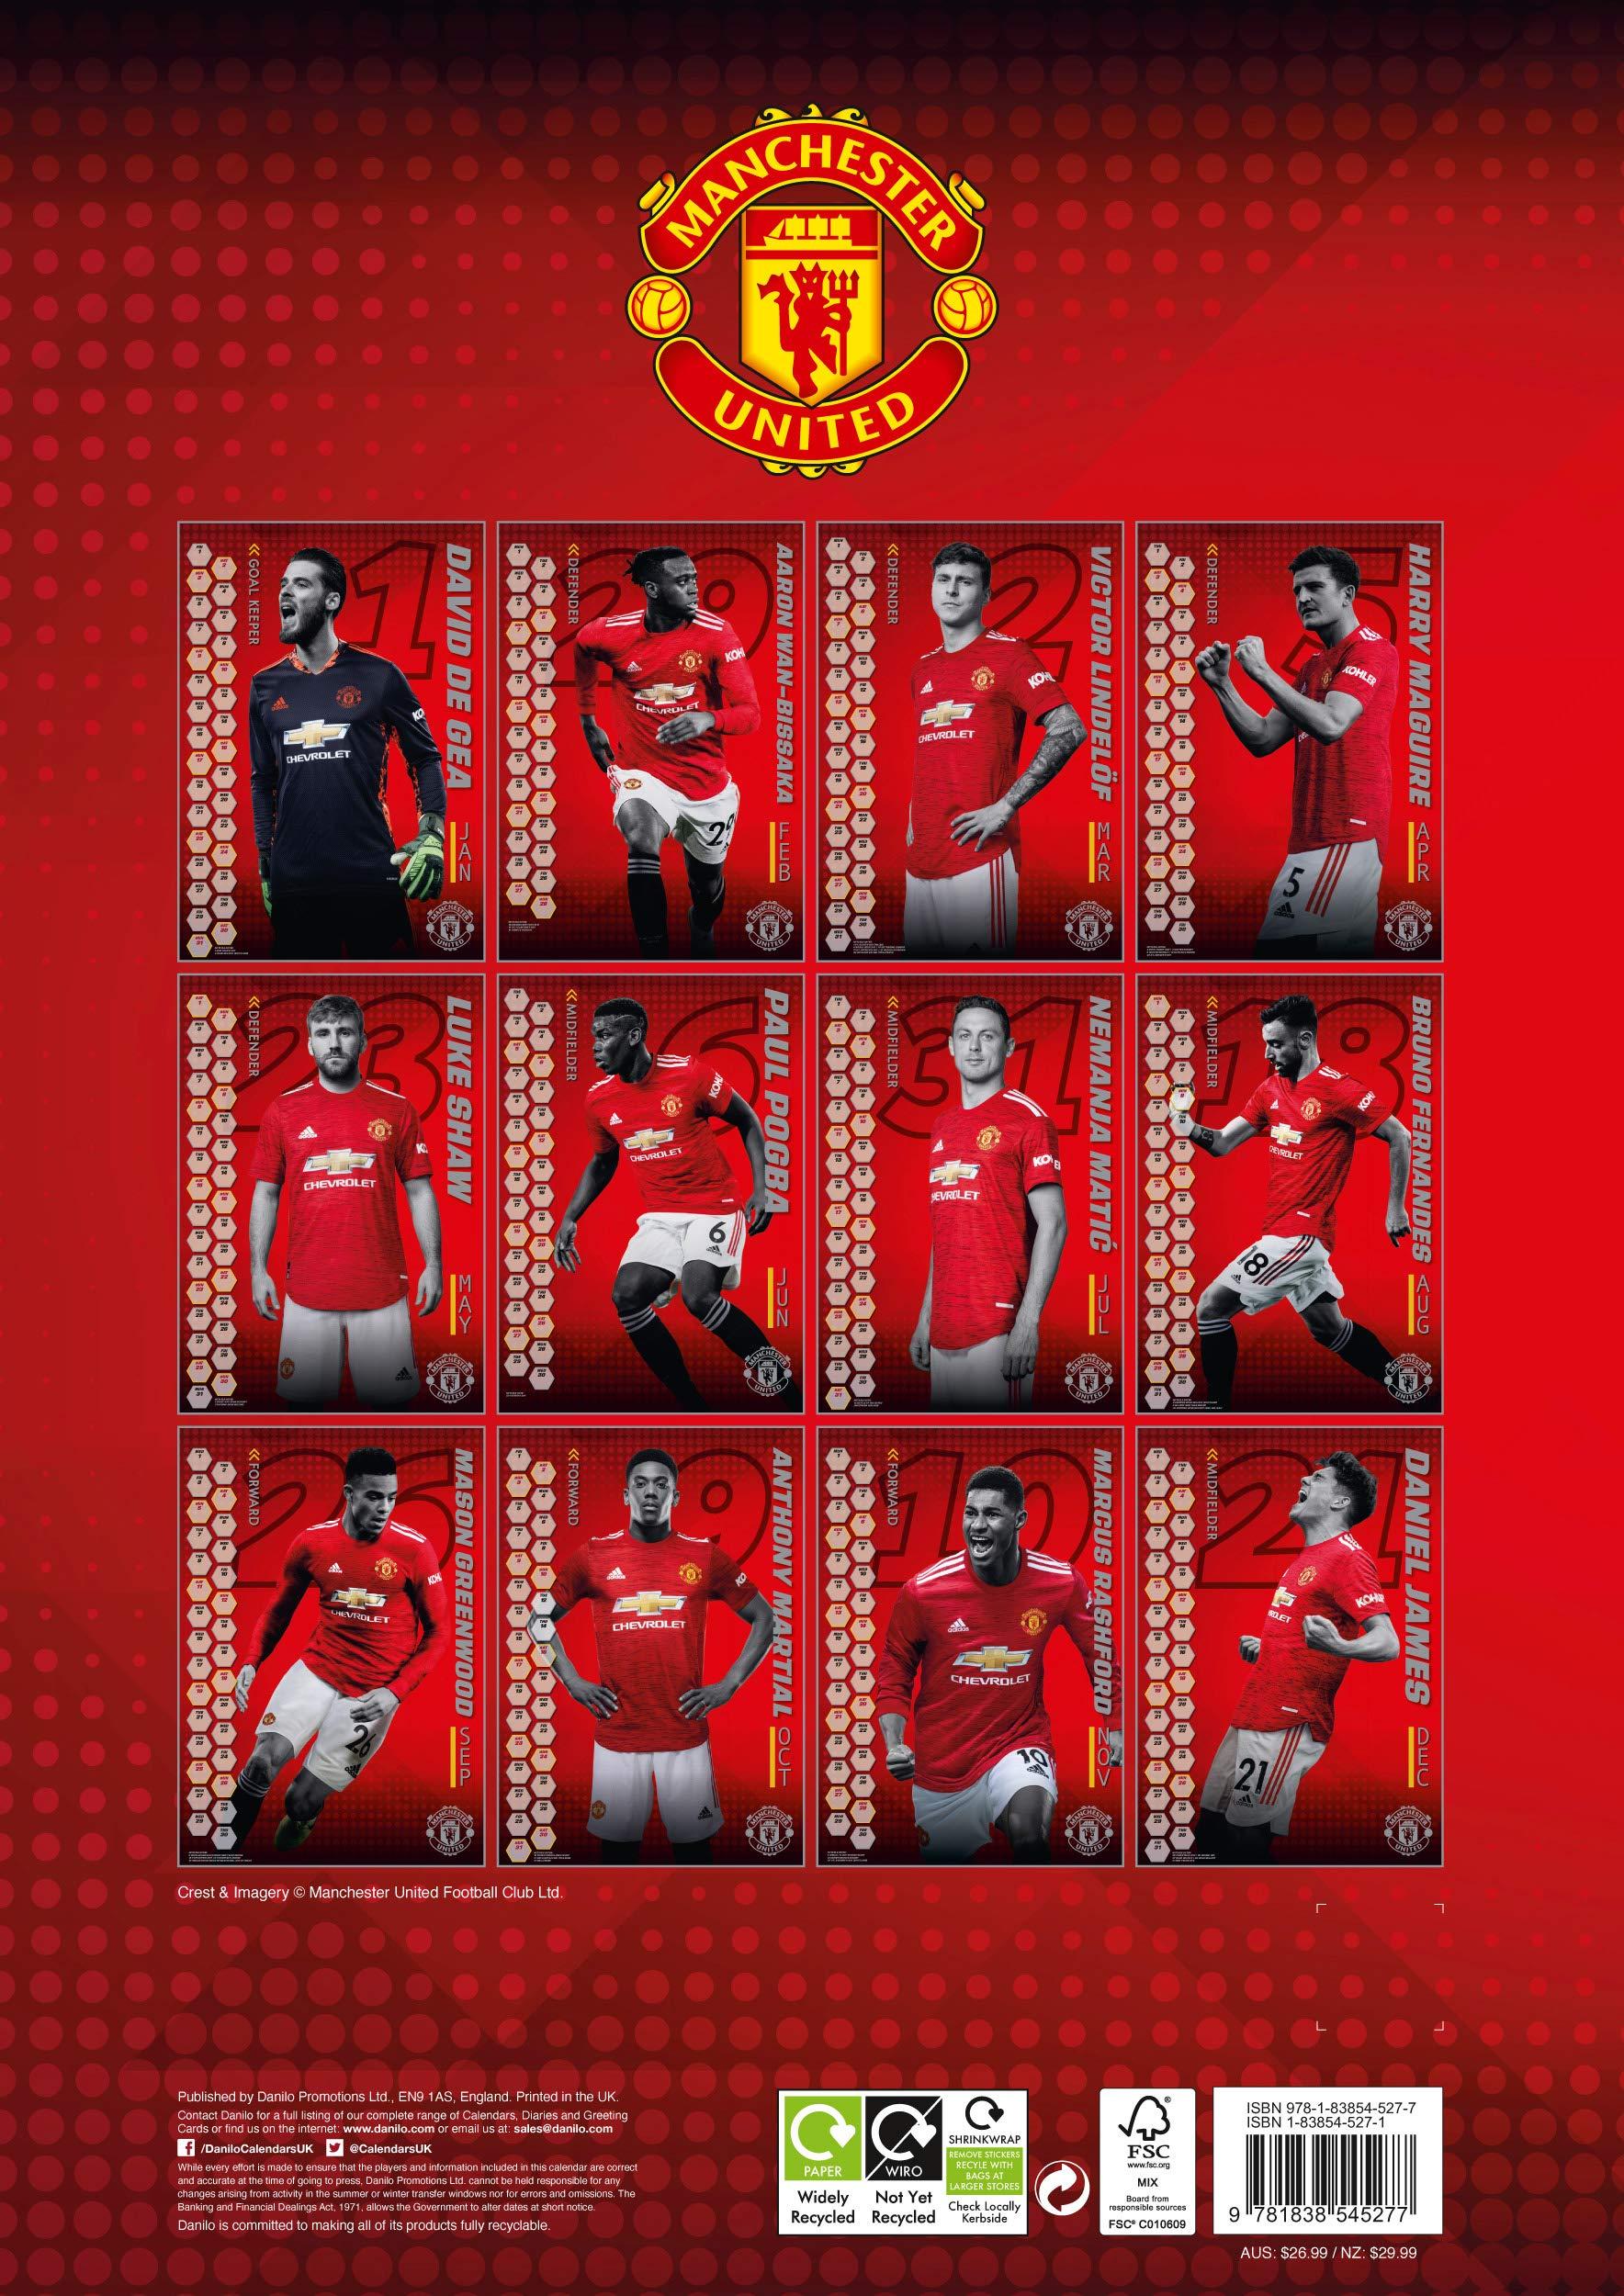 Utd Calendar 2021 The Official Manchester United Calendar 2021: United, Manchester